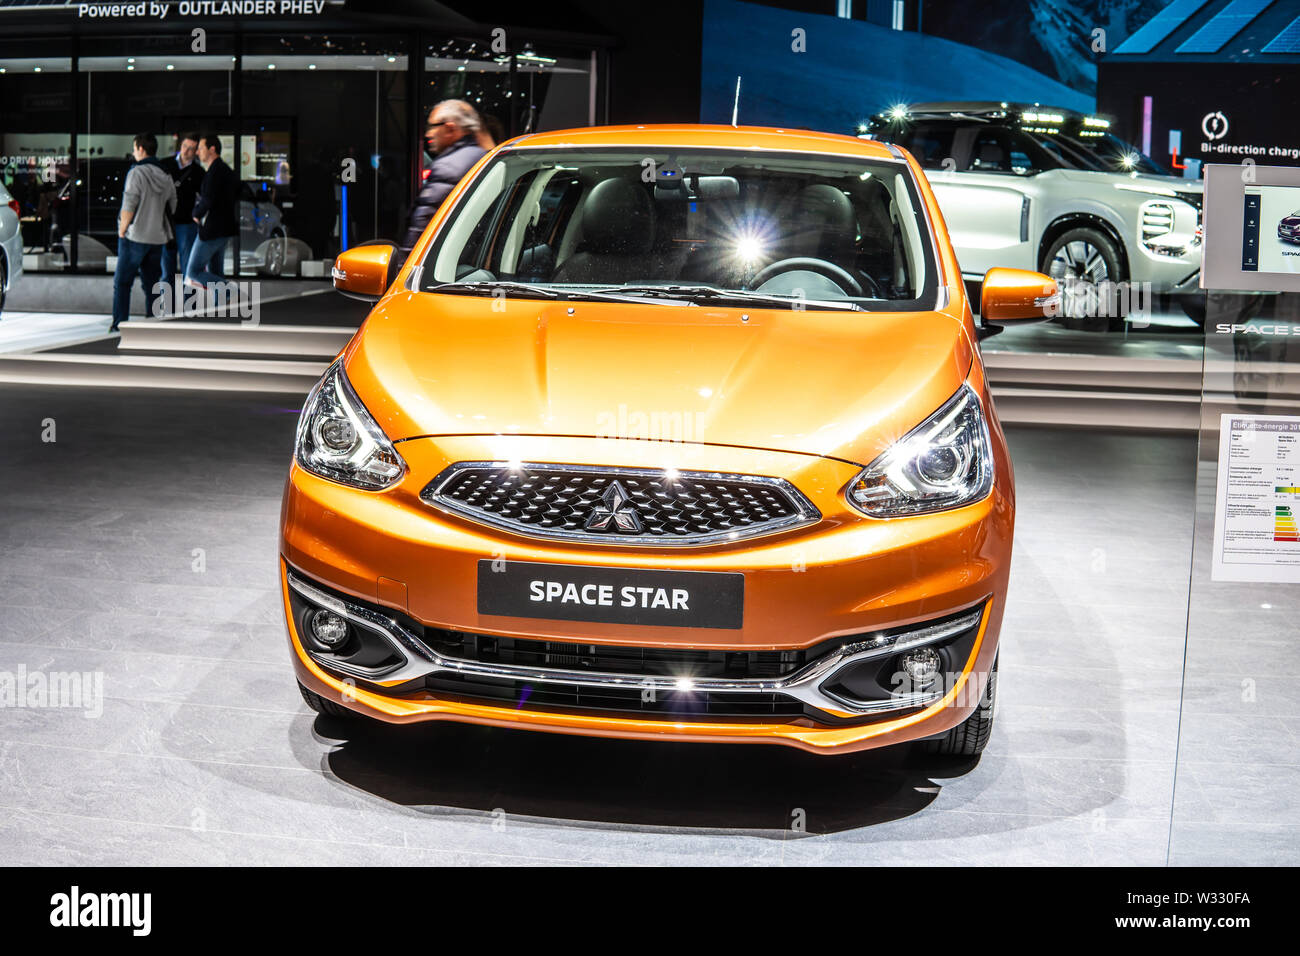 Mitsubishi Motors Stock Photos & Mitsubishi Motors Stock